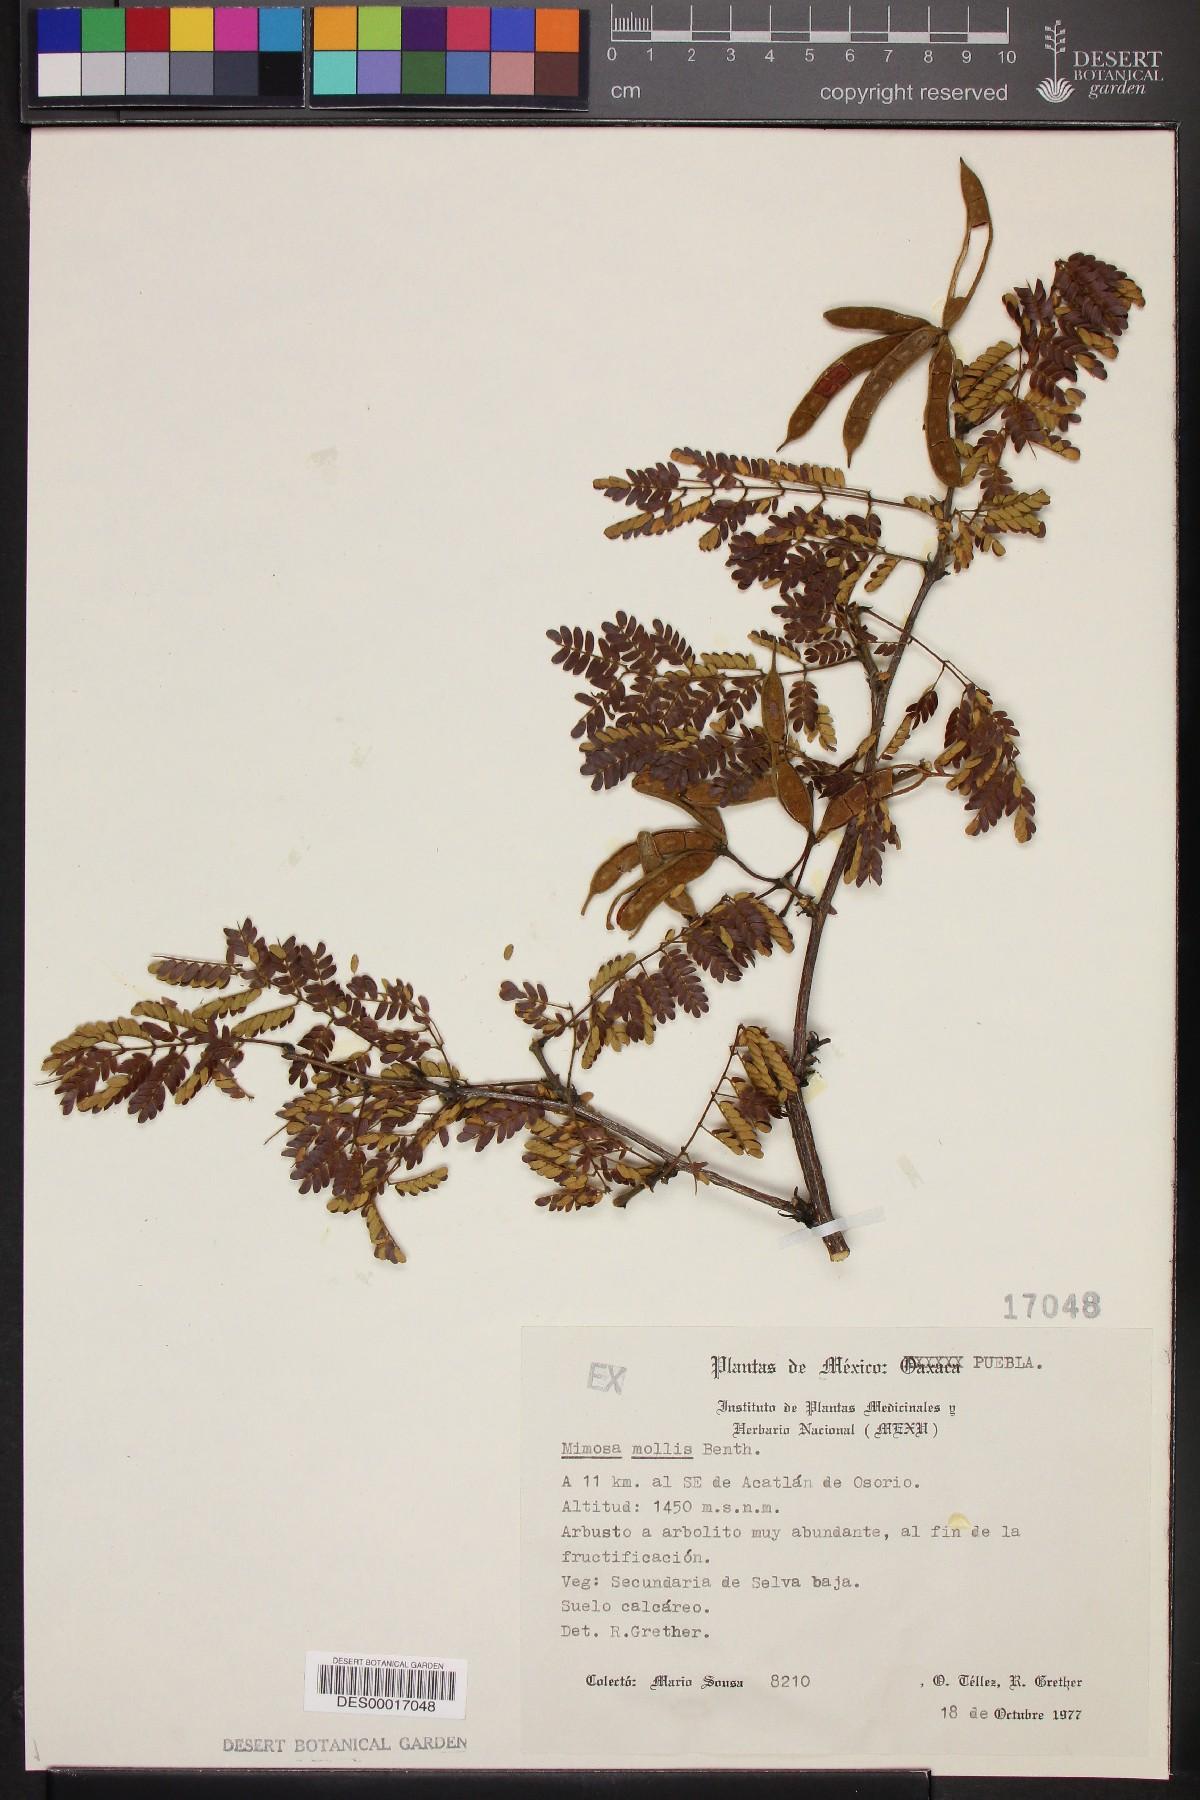 Mimosa mollis image